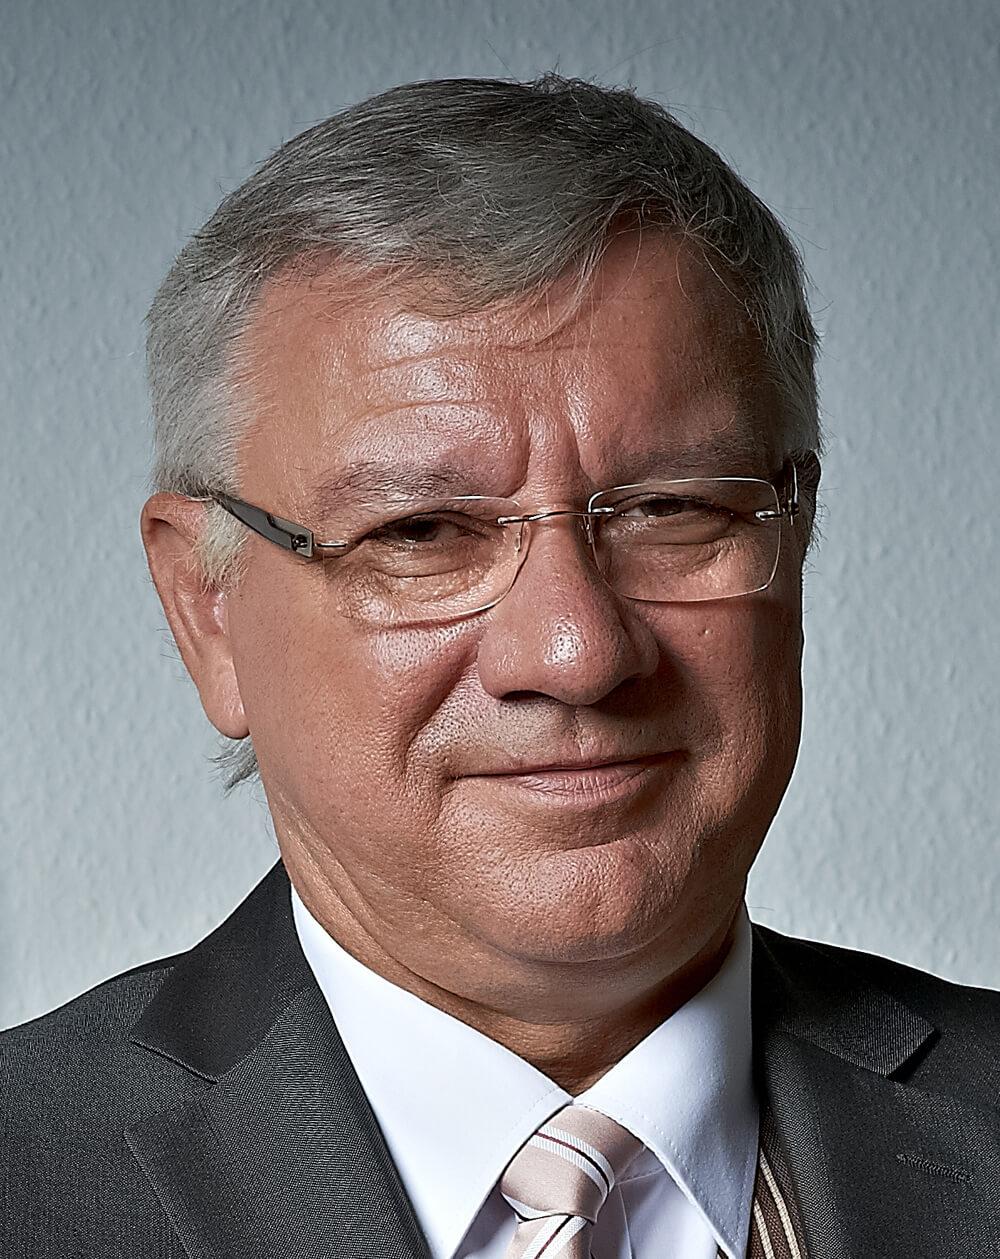 Der Koblenzer Oberbürgermeister Prof. Dr. Joachim Hofmann-Göttig